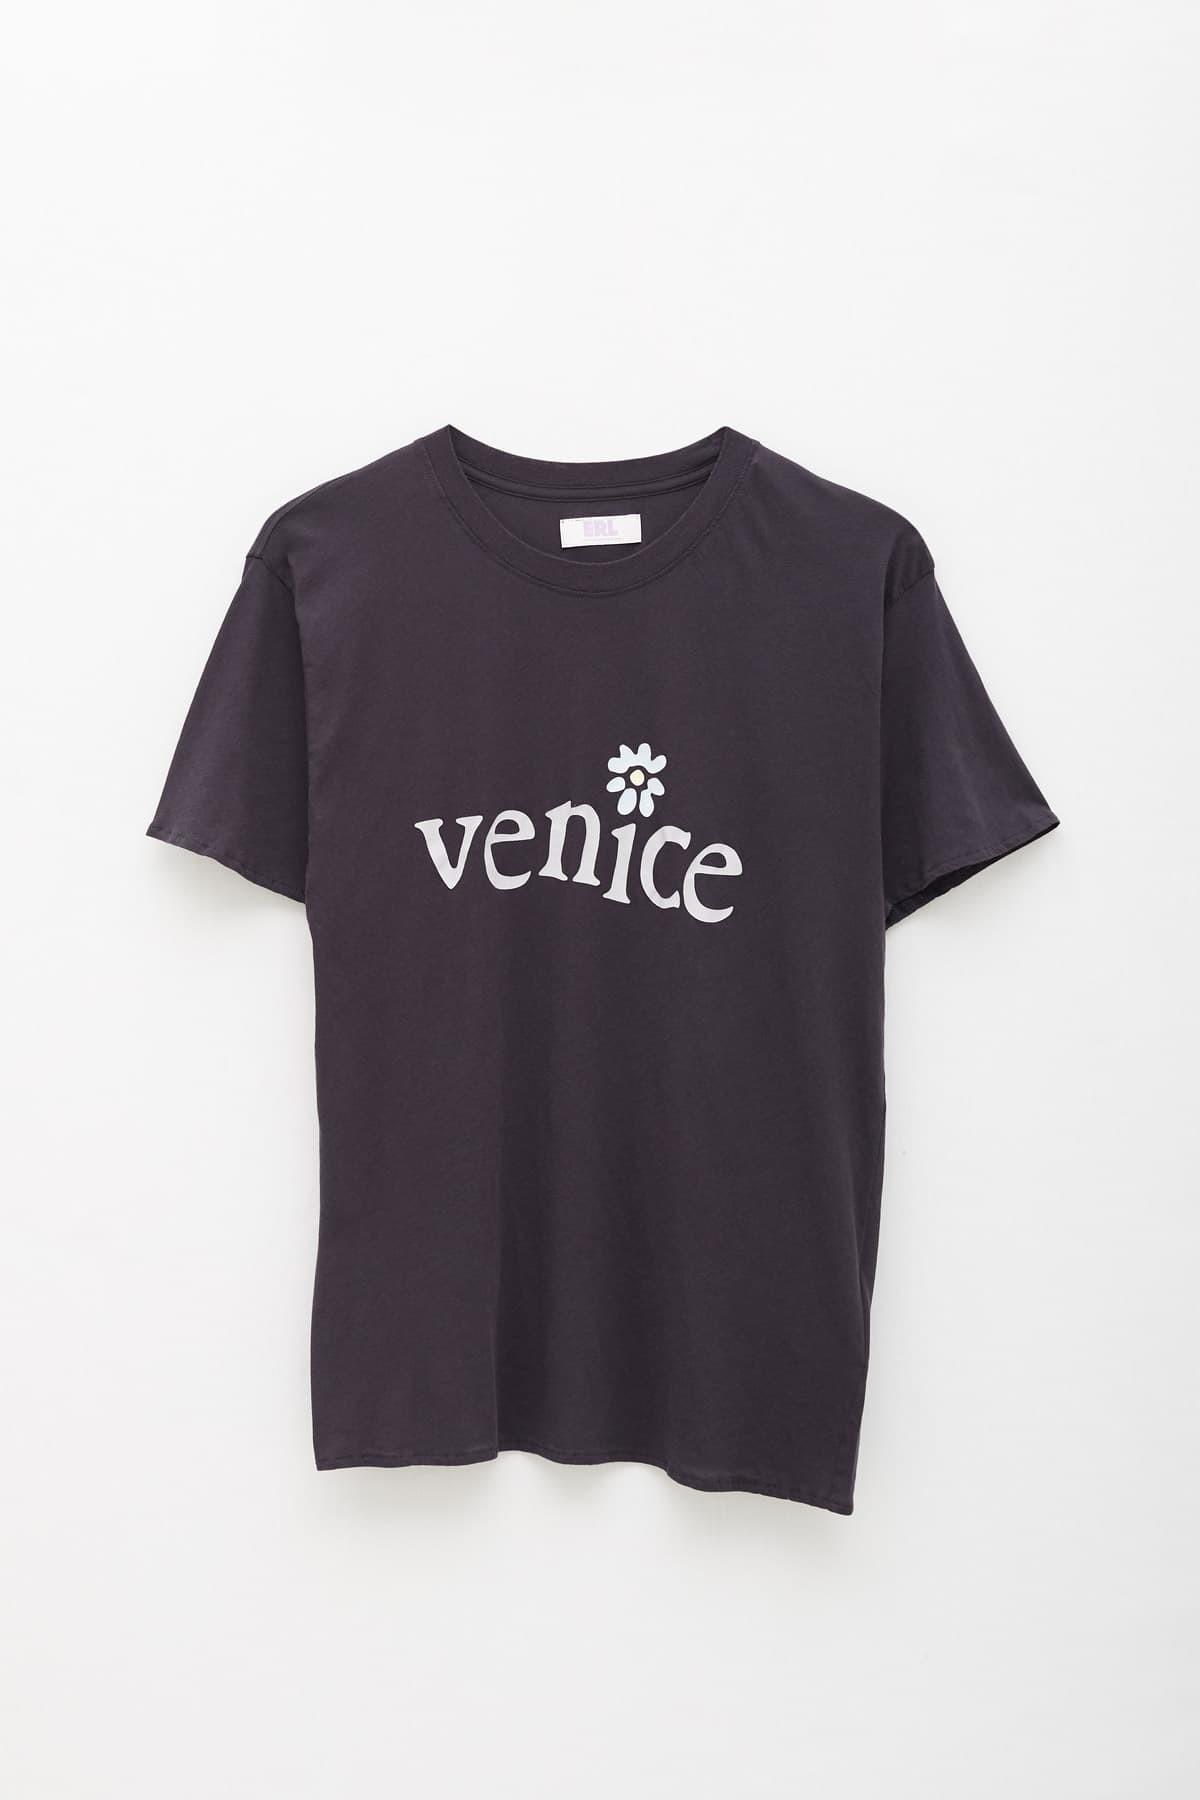 Acne Studios Cognac Brown Forban Pink Label Sweatshirt